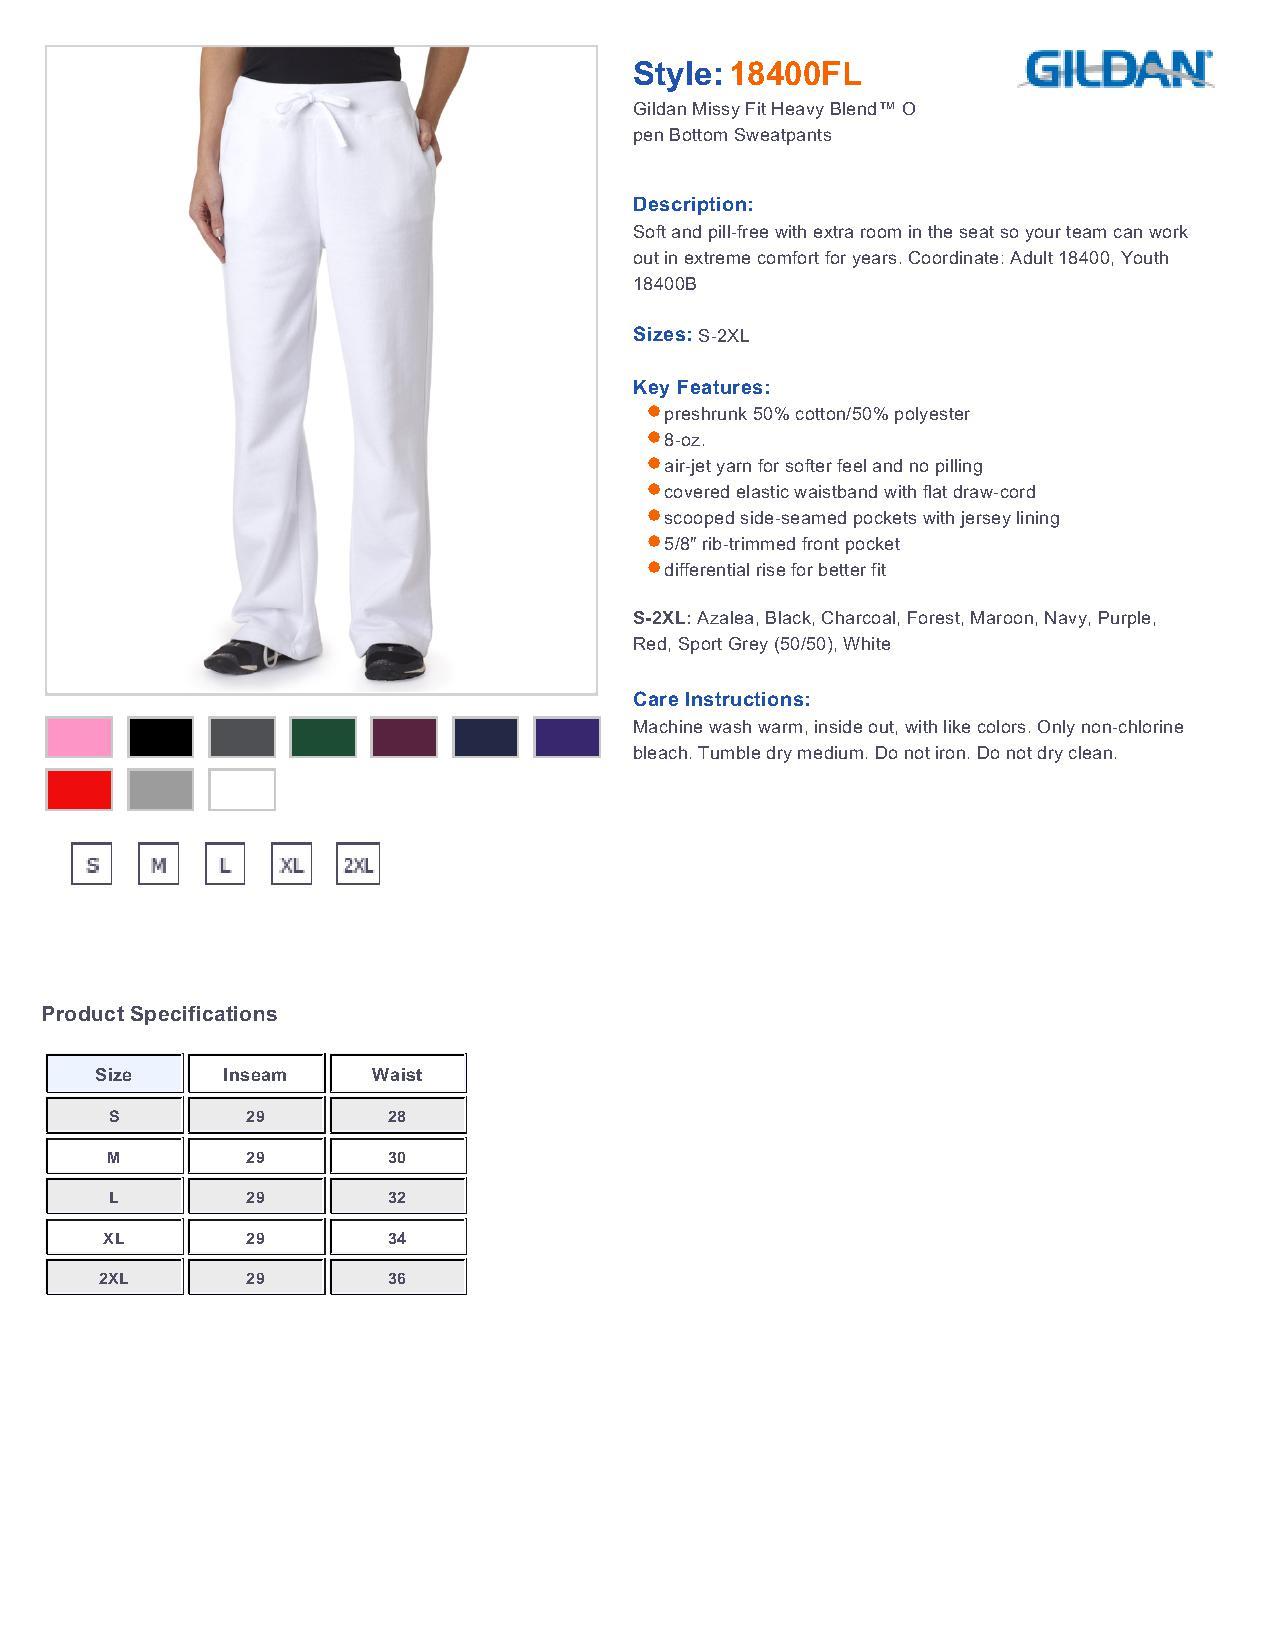 Gildan Sweatpants Sizing Chart Size Chart For Gildan G18400 Heavy